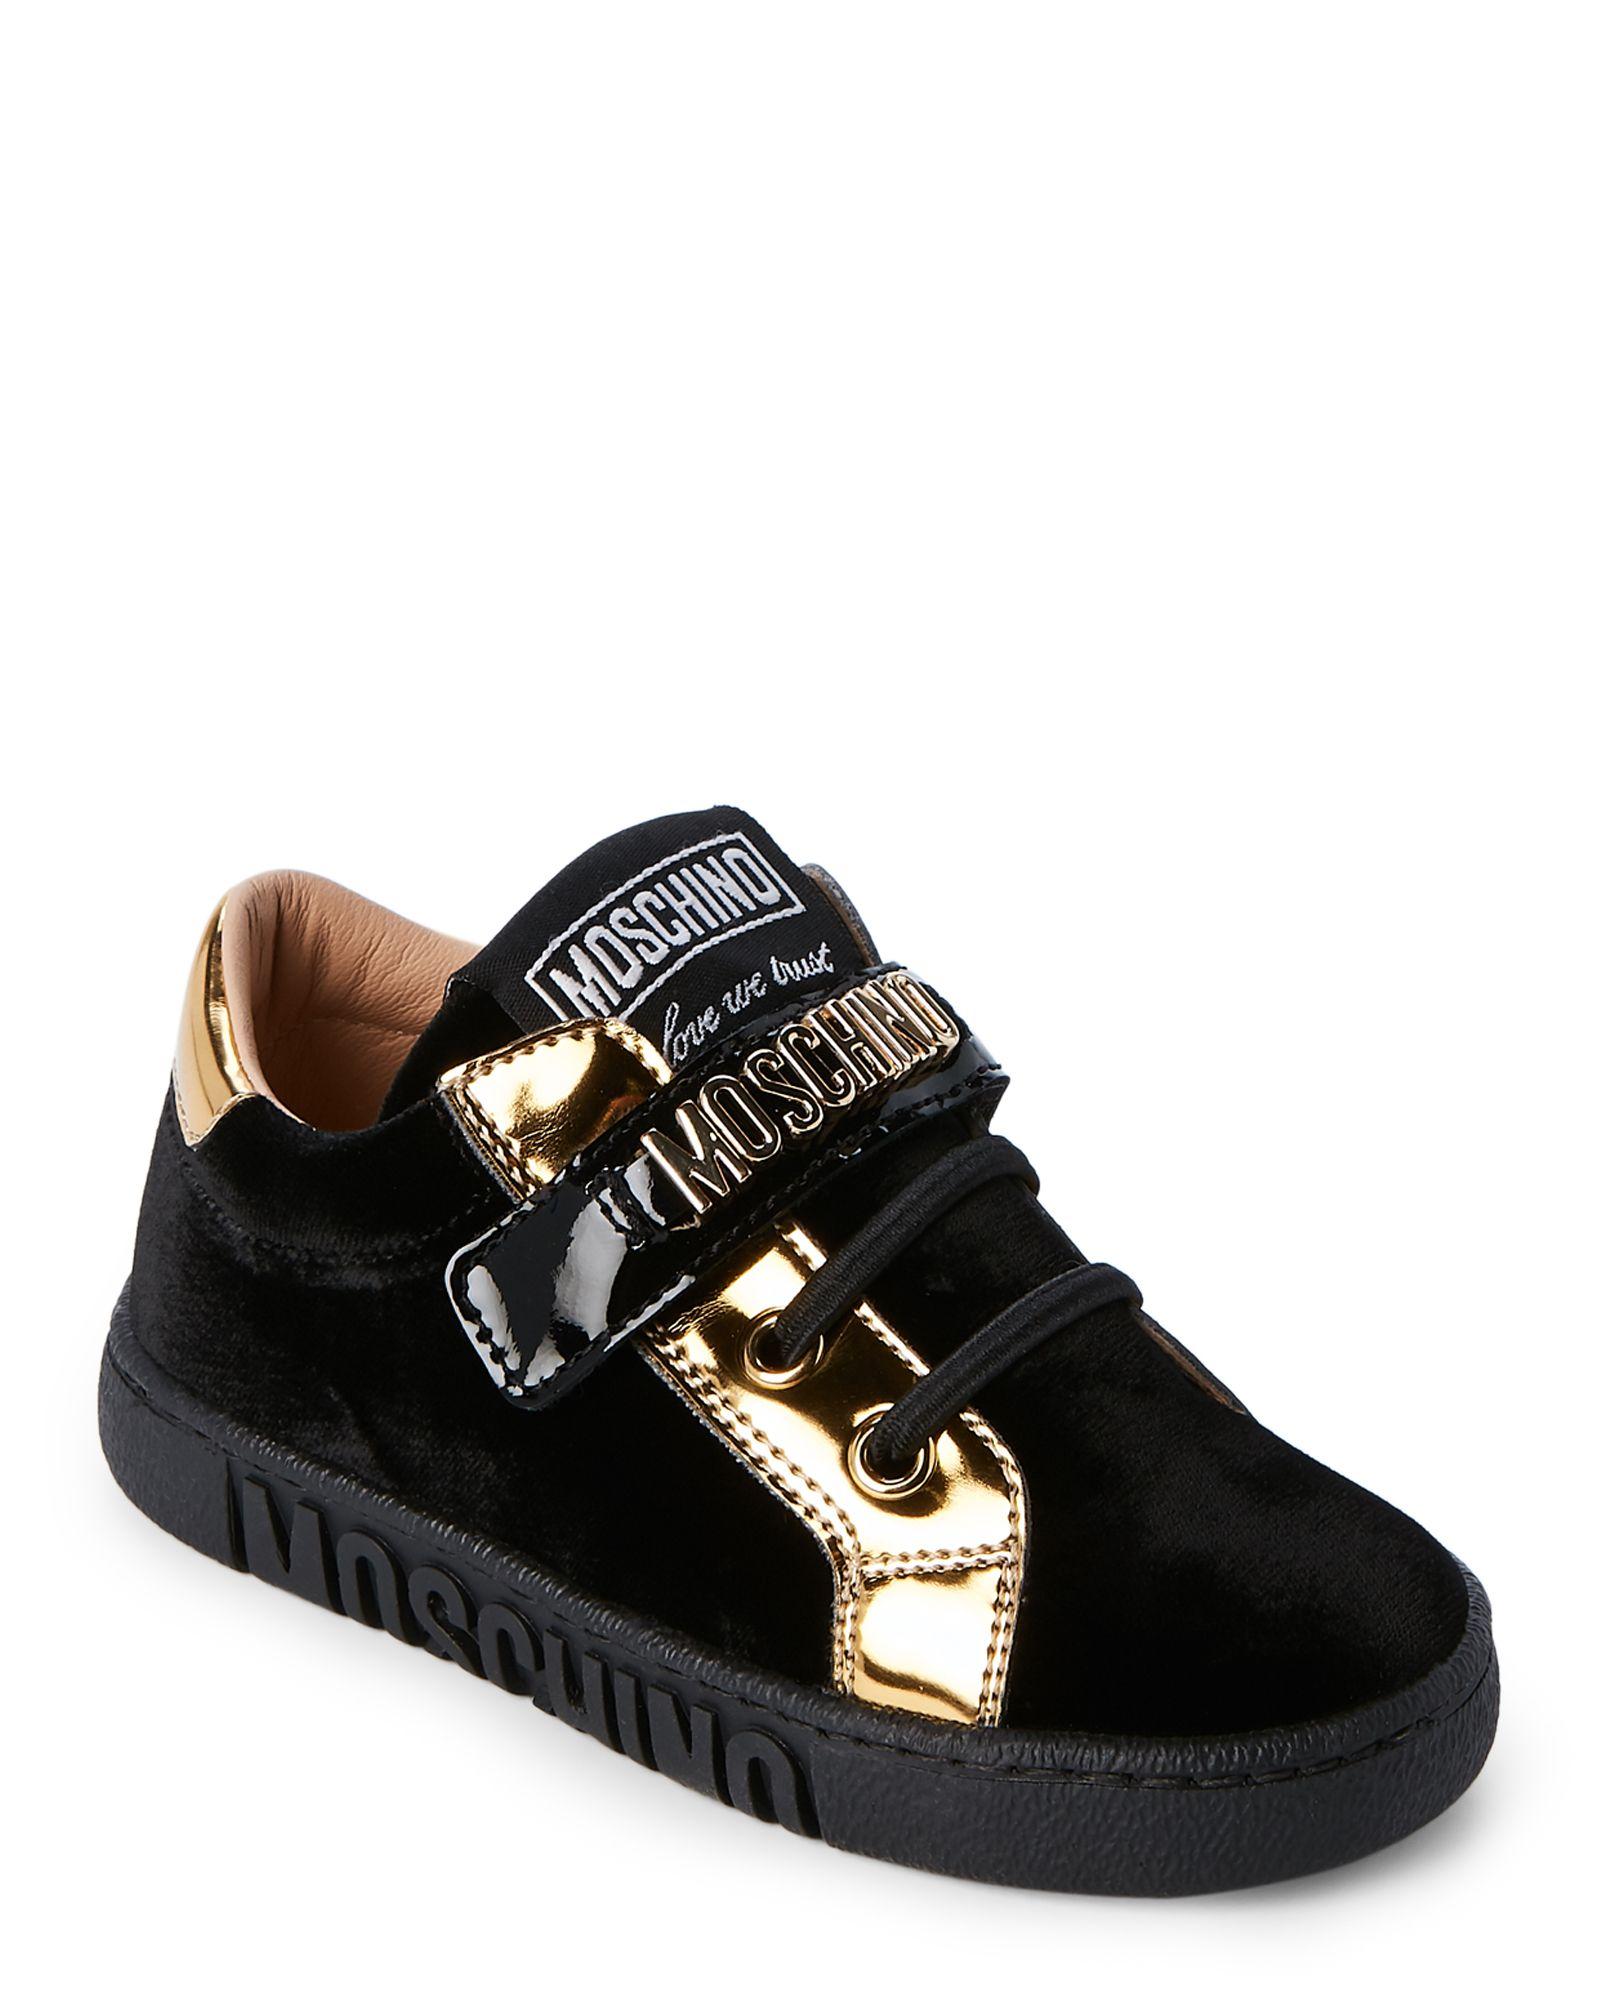 0dc2cc86cfc9 Moschino (Toddler Boys) Black Velvet Logo Sneakers